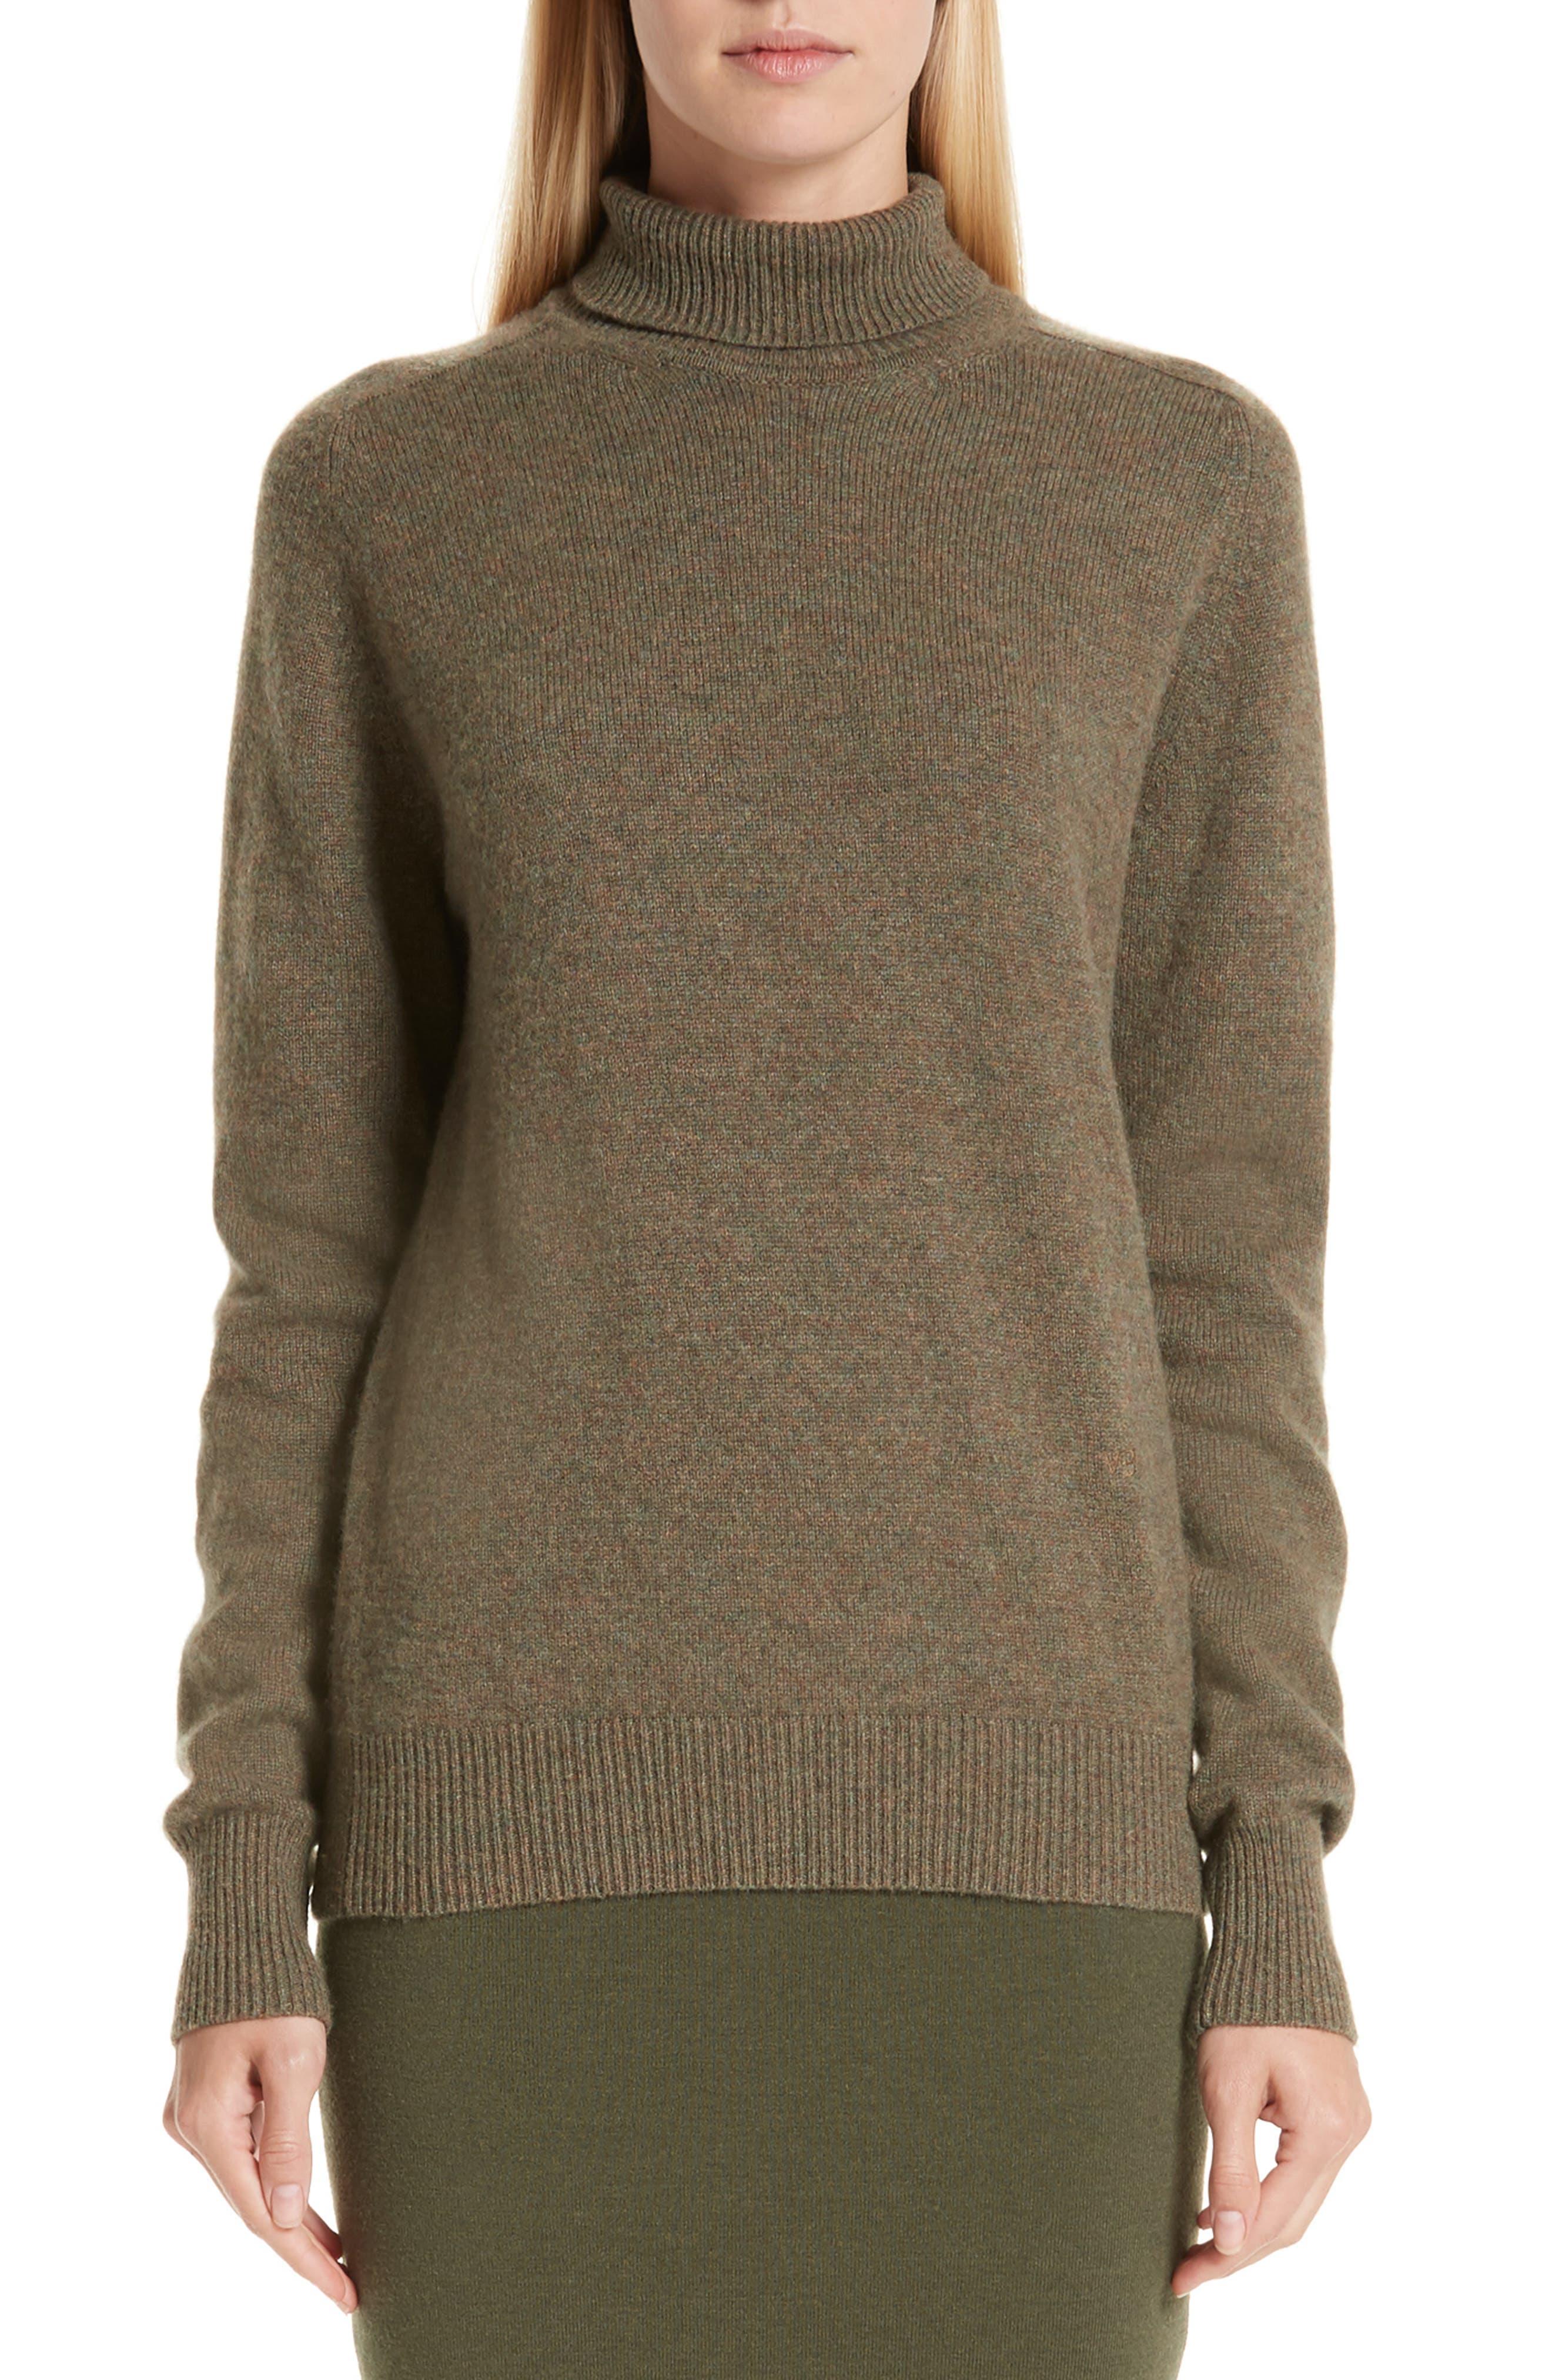 Stretch Cashmere Turtleneck Sweater, Main, color, 300